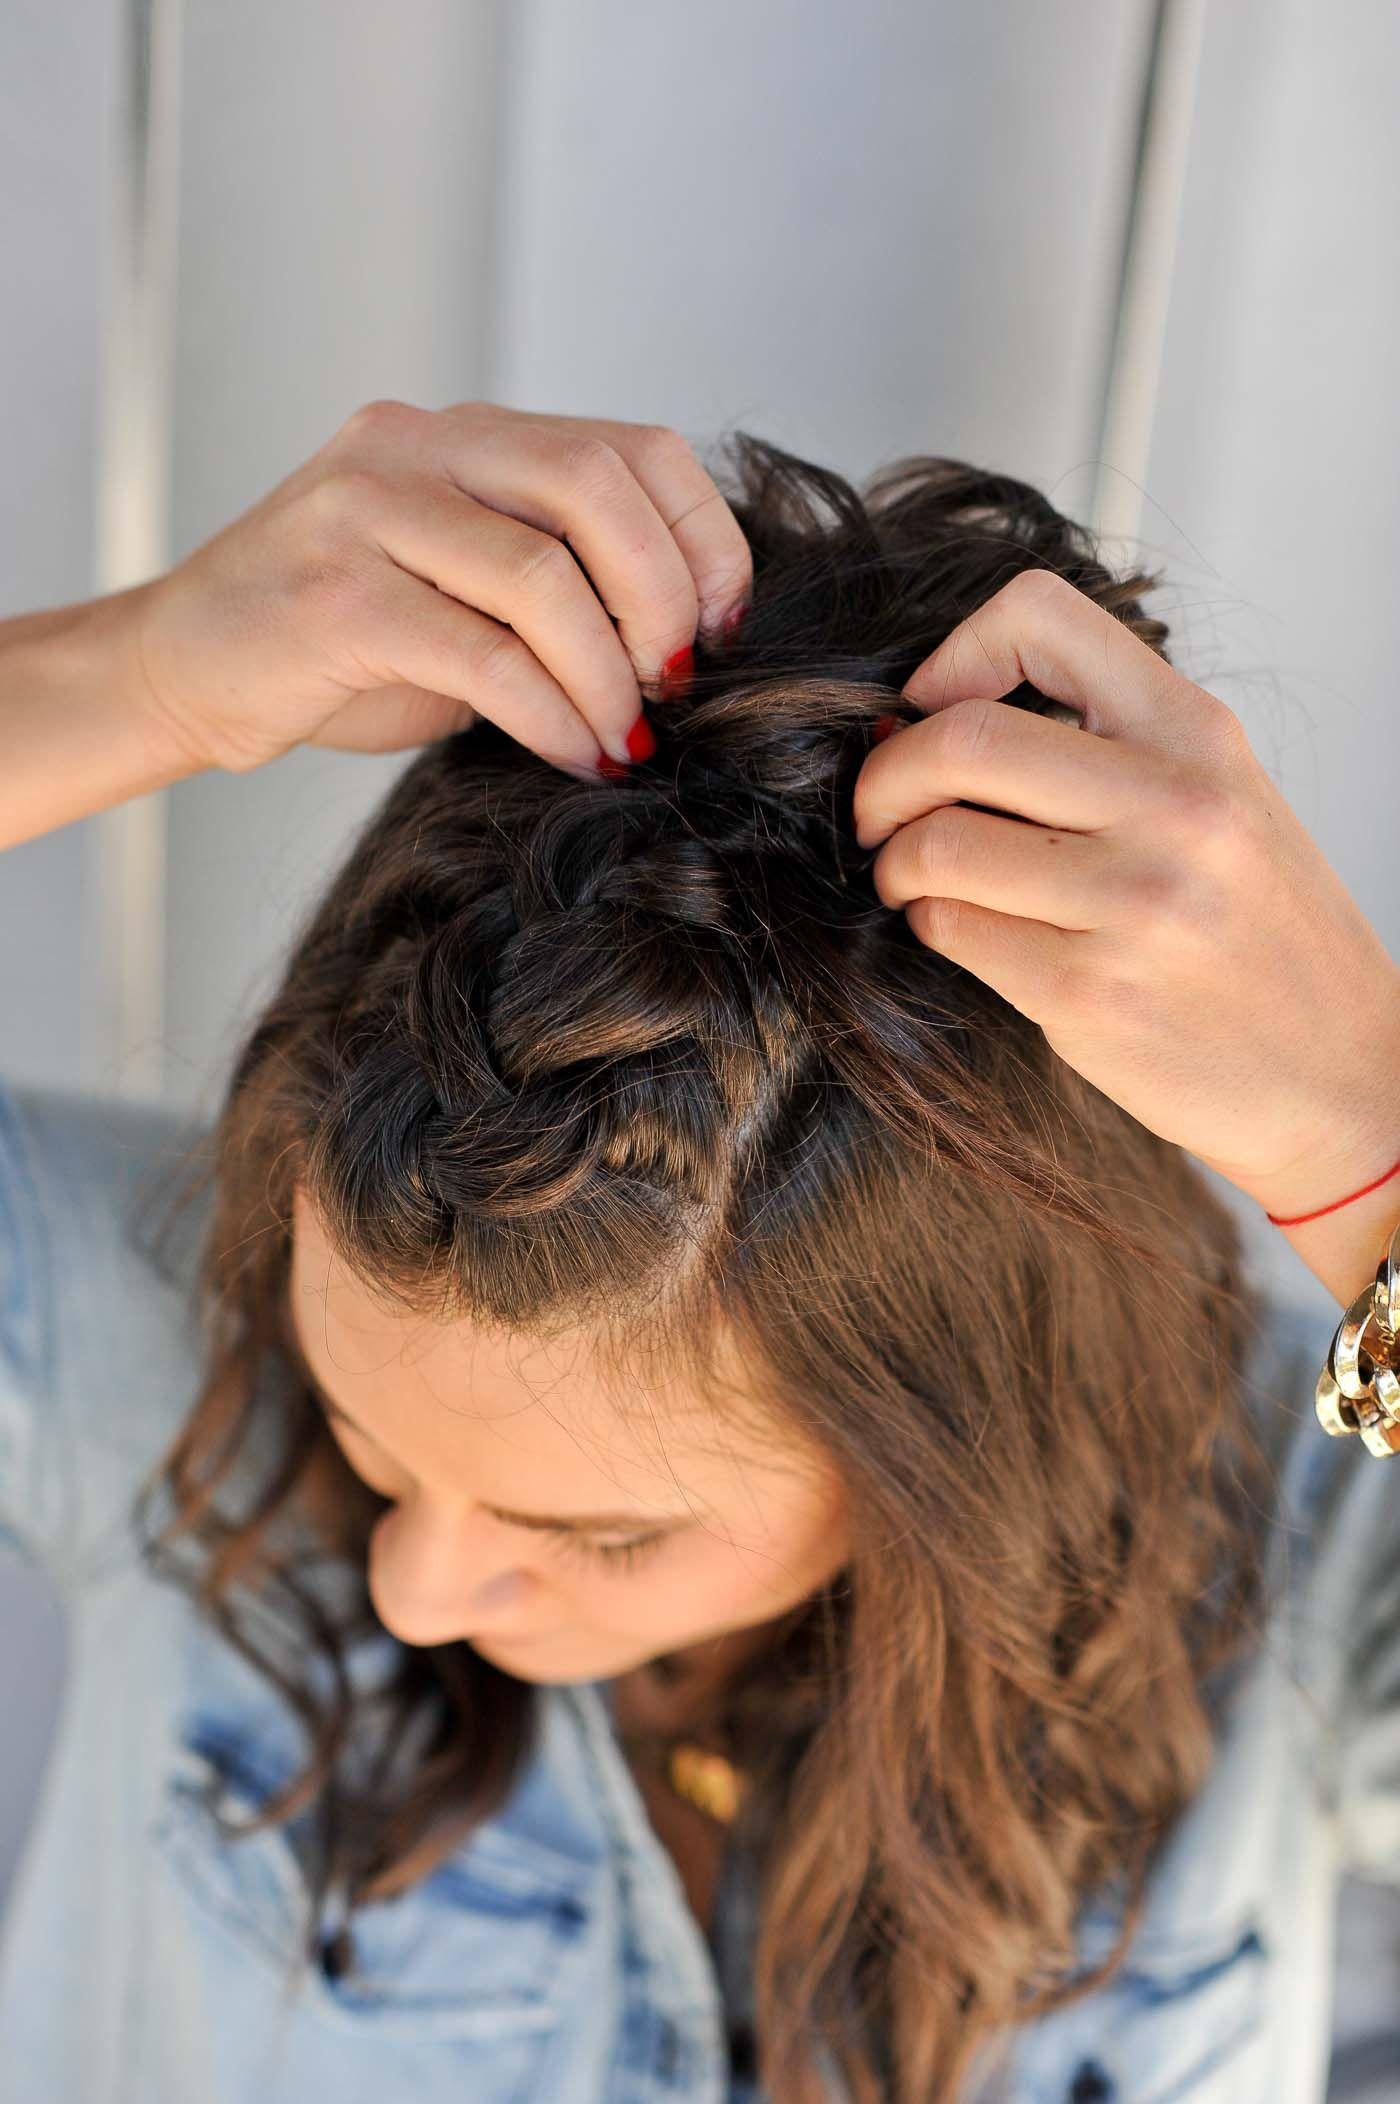 Braided Half Up Half Down Hairstyle Tutorial Braids For Short Hair Short Hair Updo Braided Half Up